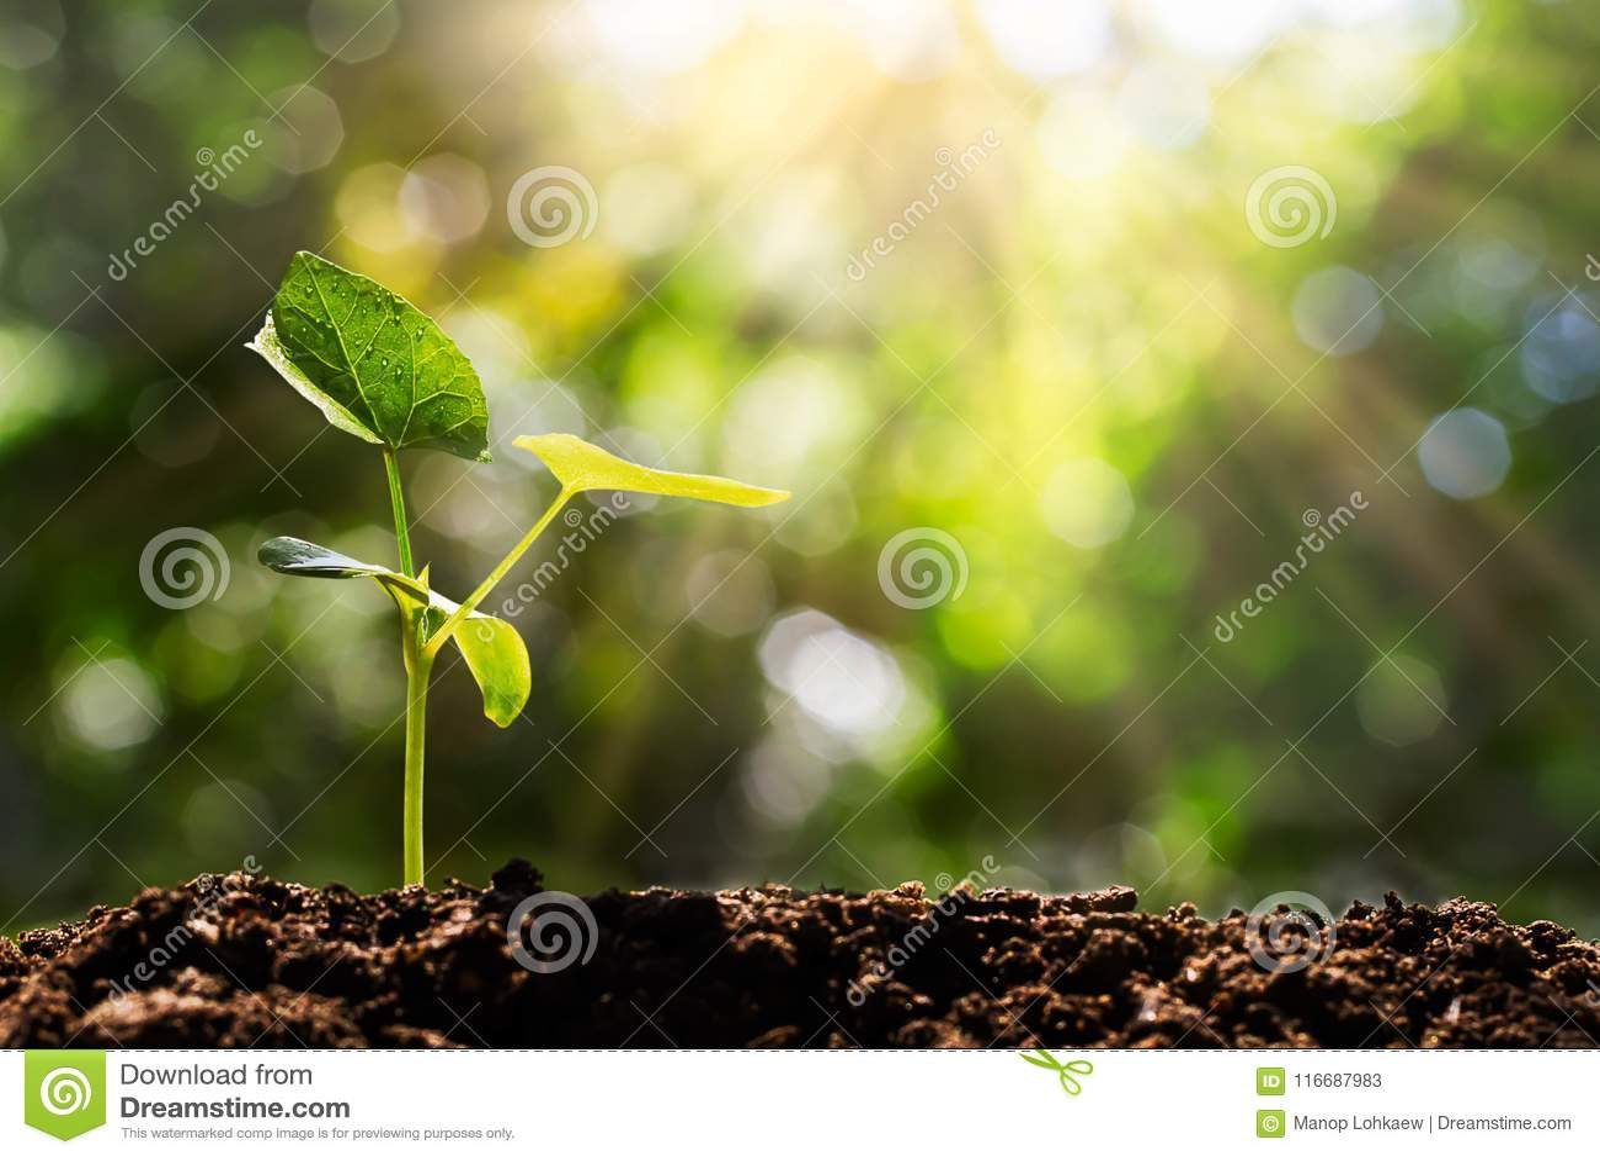 Brotar no bokeh verde borrado com fundo macio da luz solar